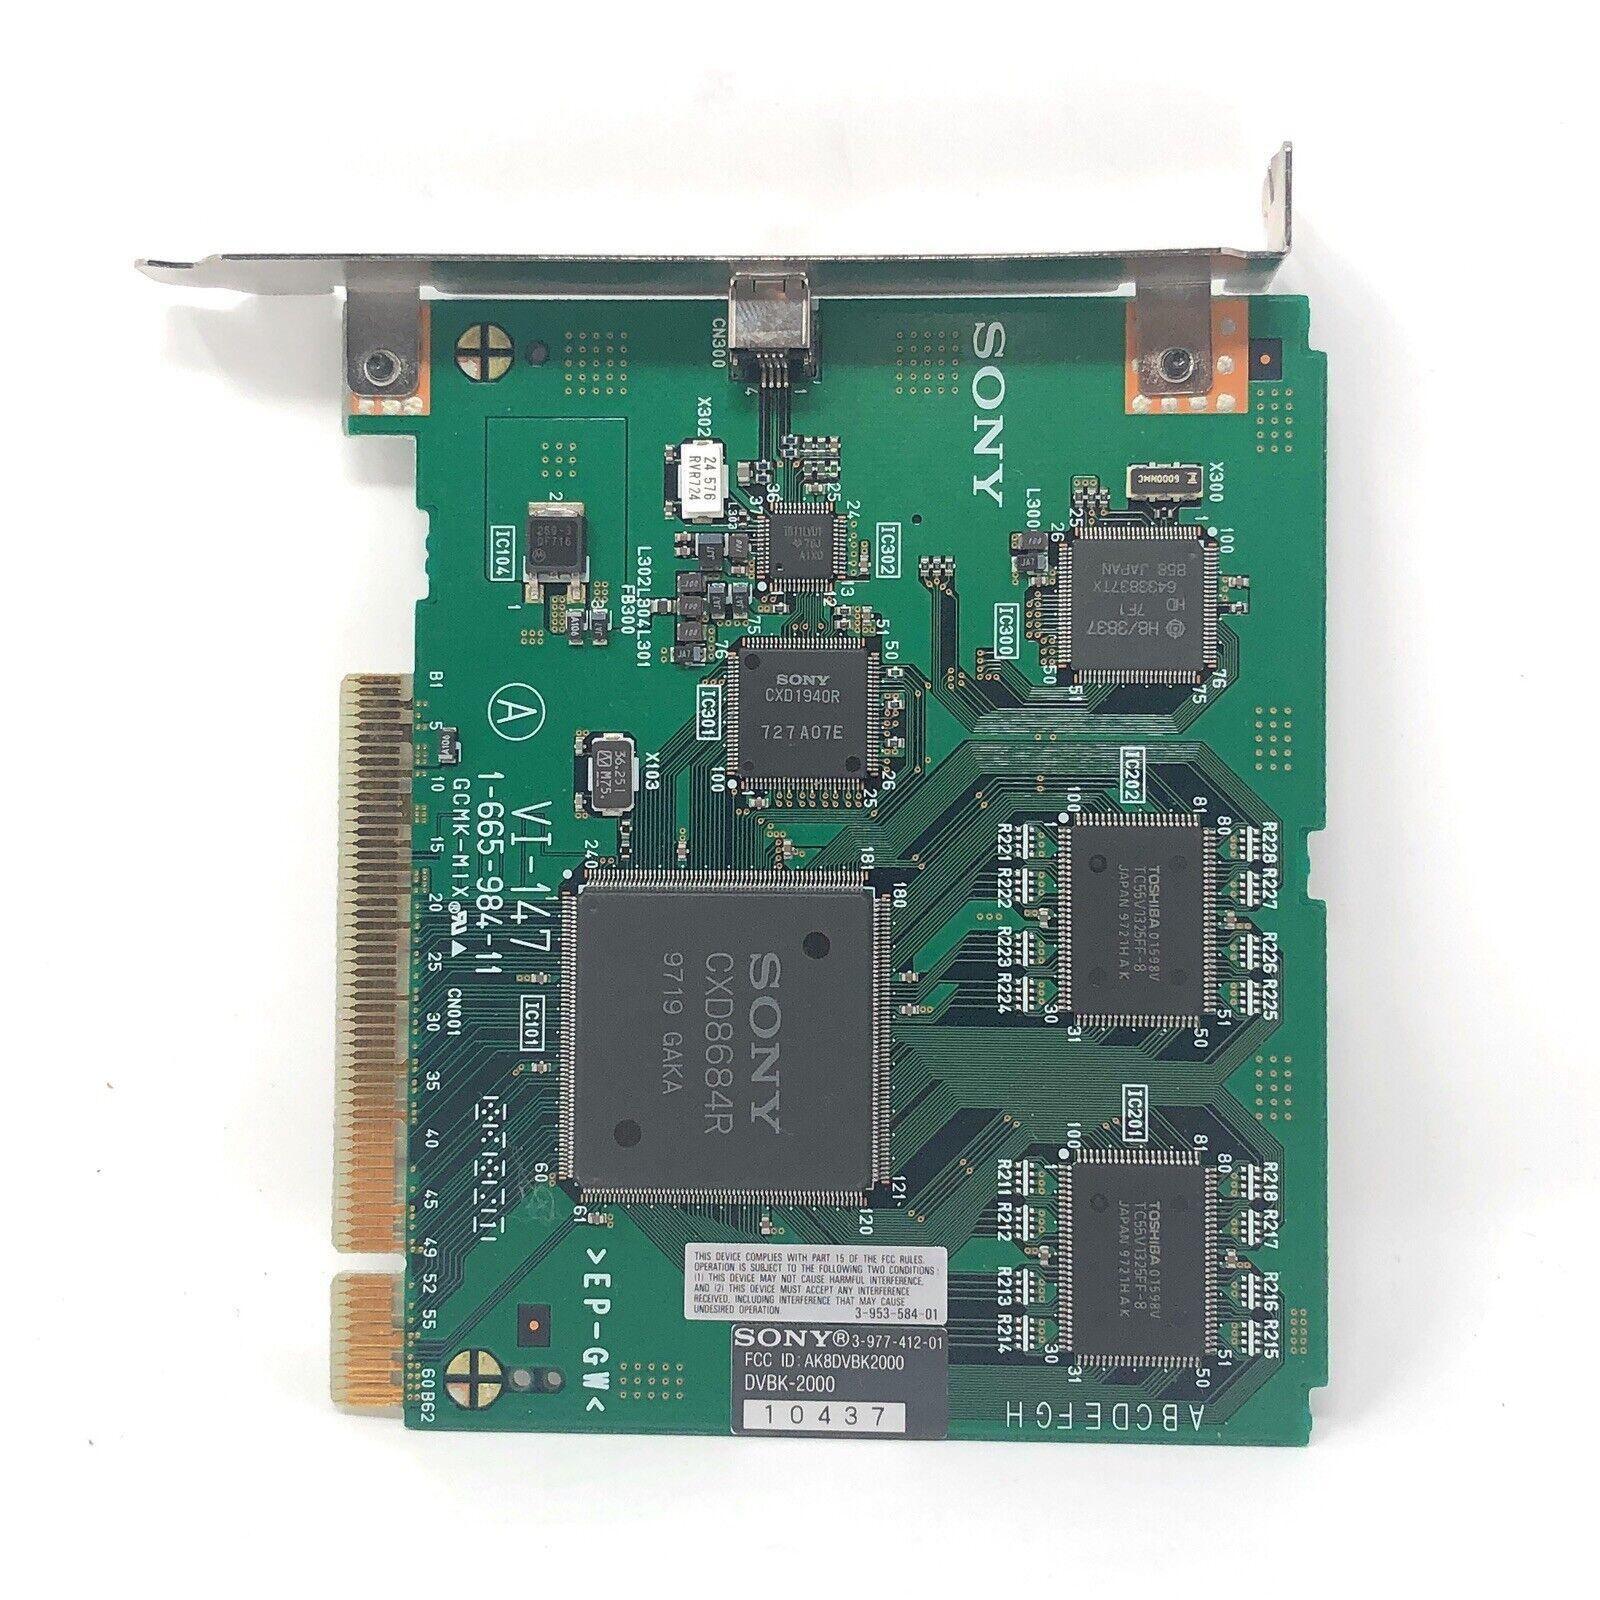 Sony DVBK-2000 FireWire IEEE 1394 Controller PCI Card AK8DVBK2000